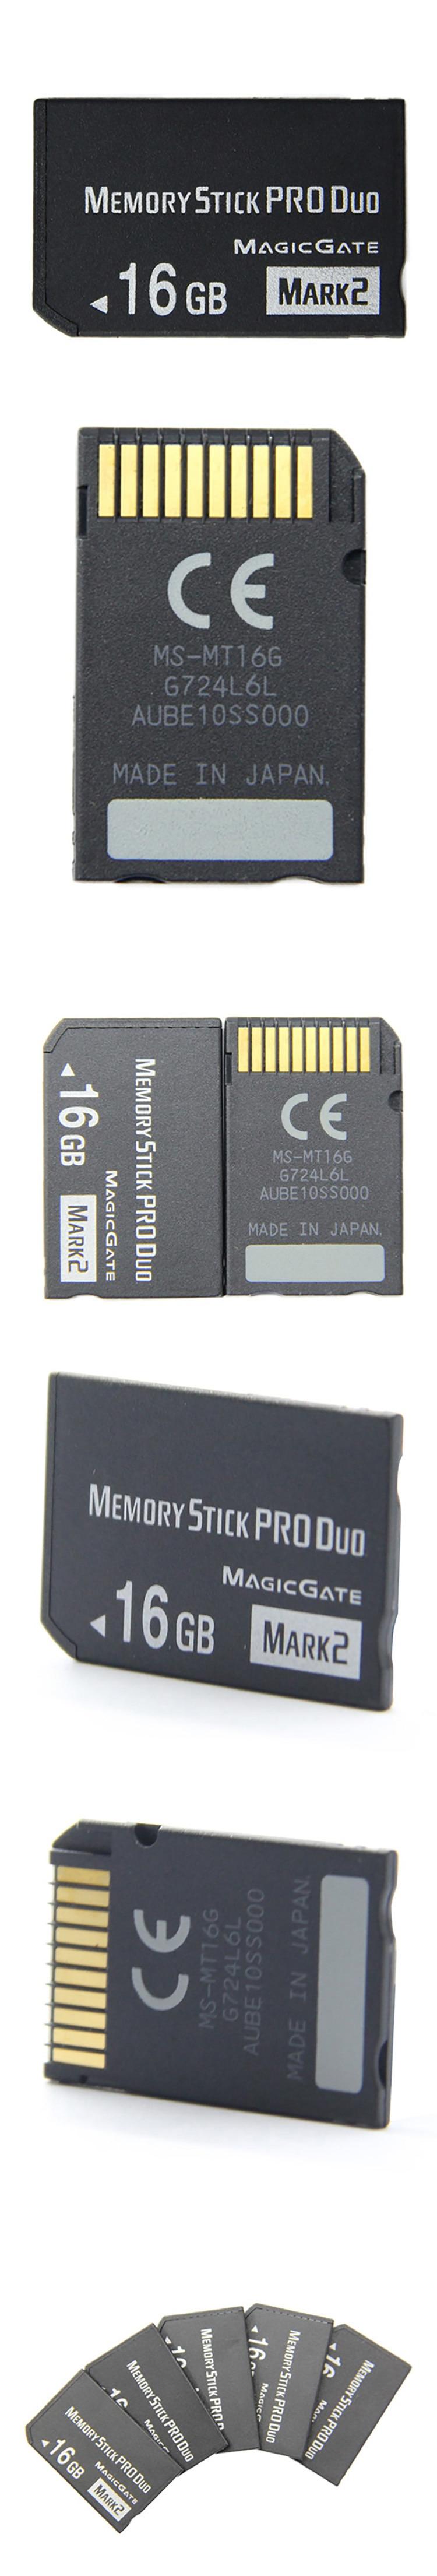 16GBMA